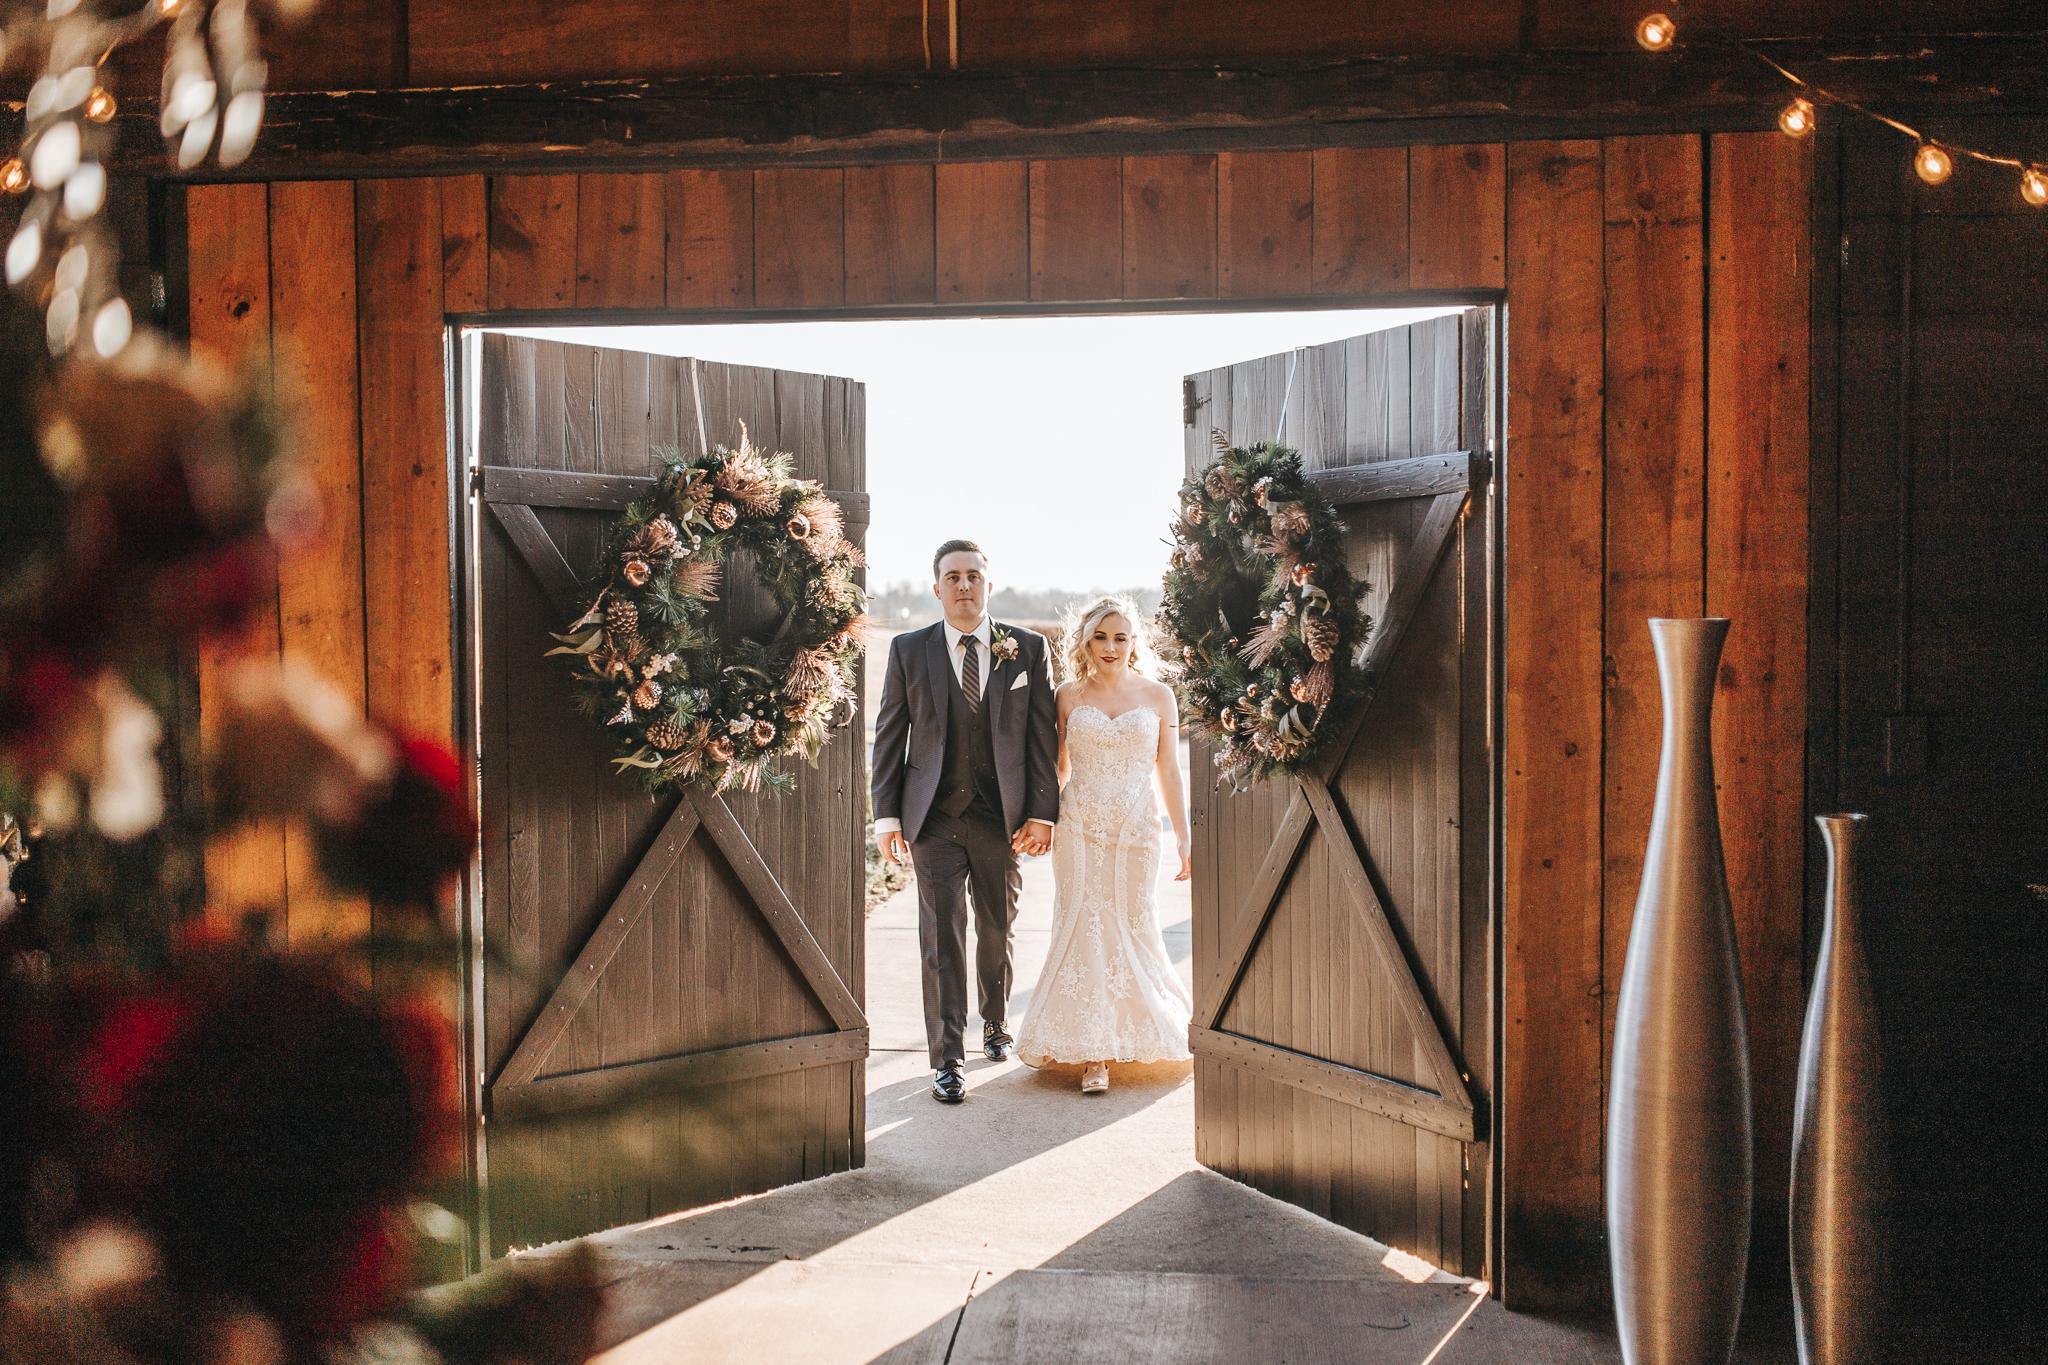 0093 Ariana Jordan Photo - Cameron & Lauren's Wedding at Talon Winery  6516.jpg